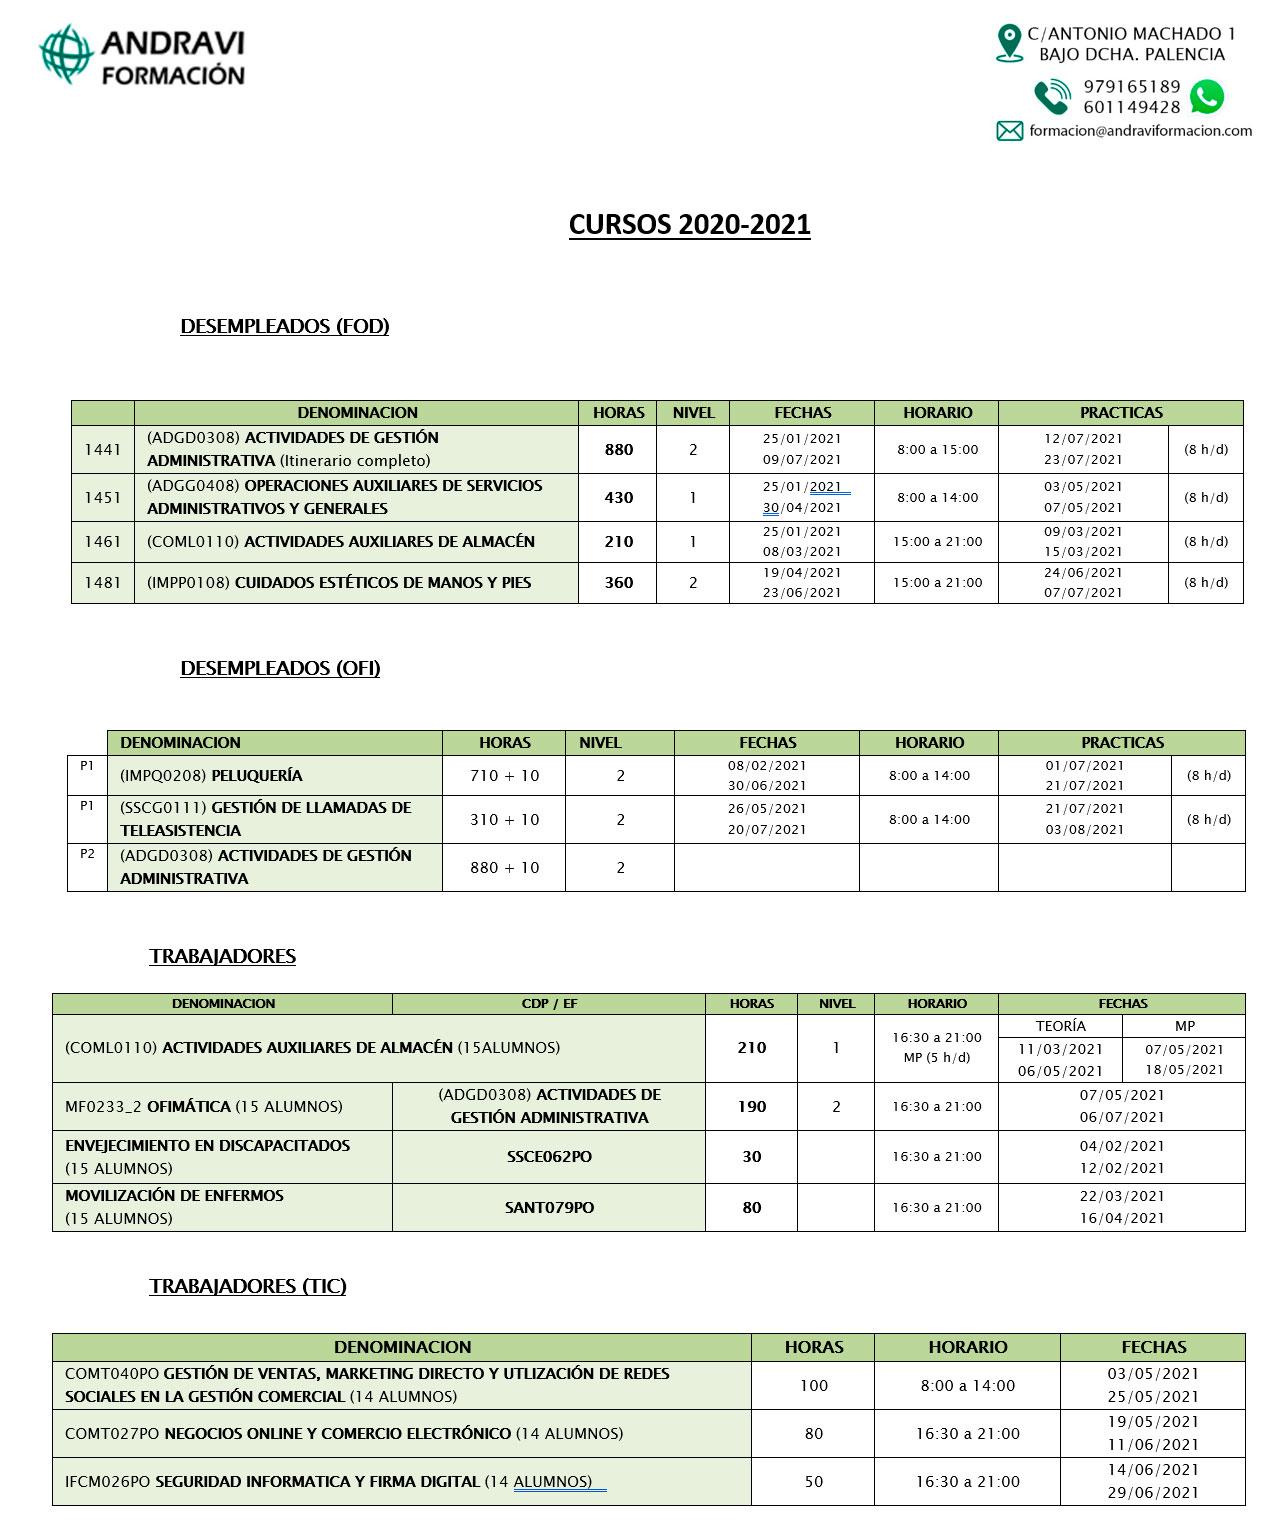 Cursos Palencia 2020-2021